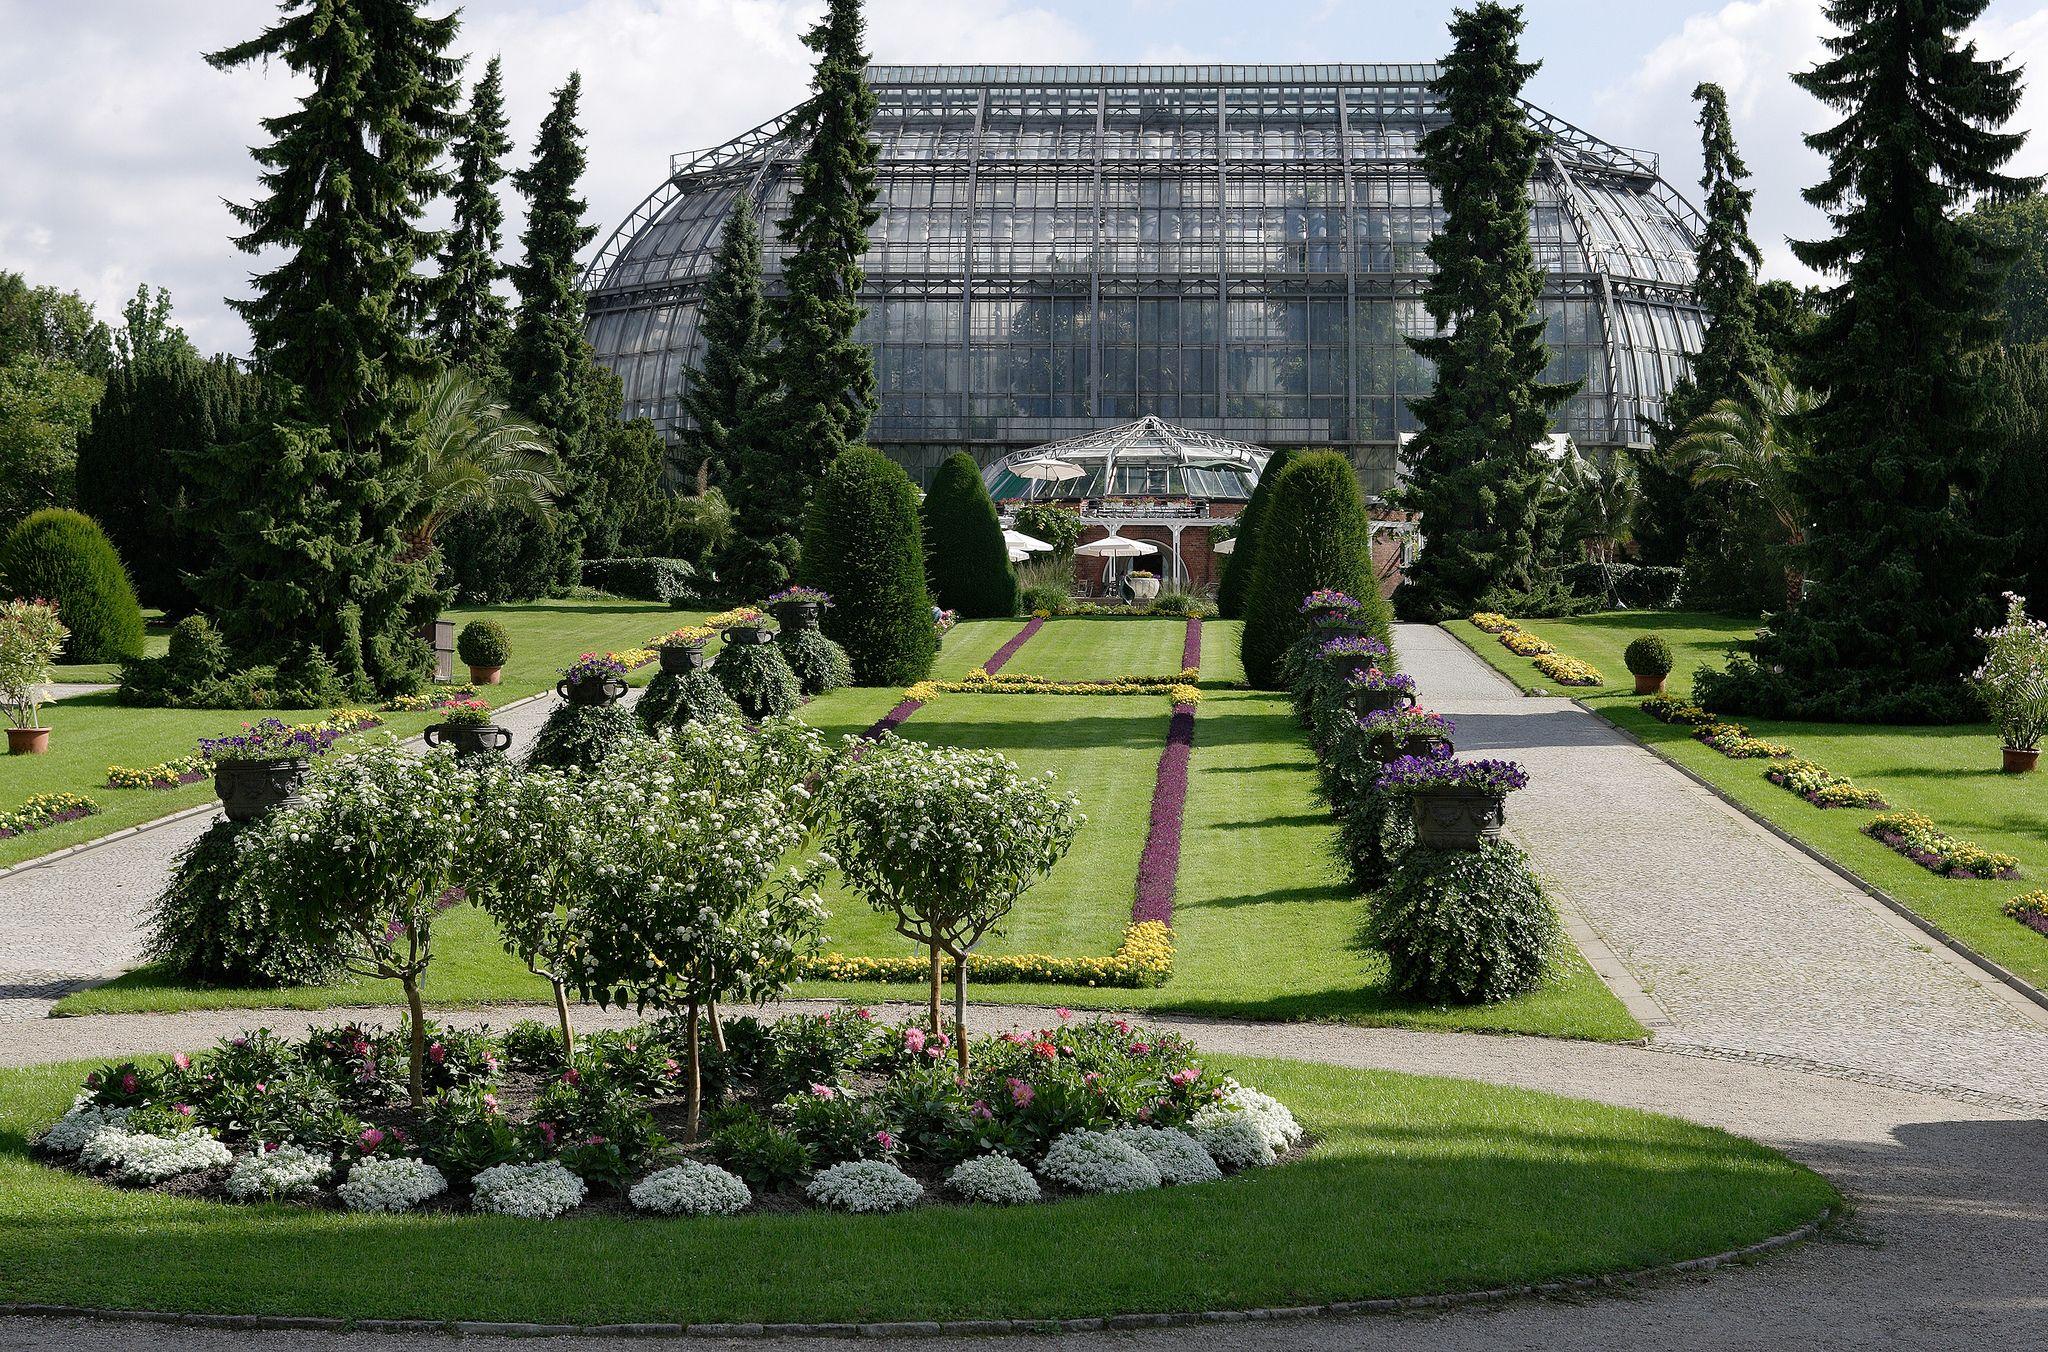 Botanischer Garten Botanical Gardens 2 Botanical Gardens Garden Features Garden Inspiration